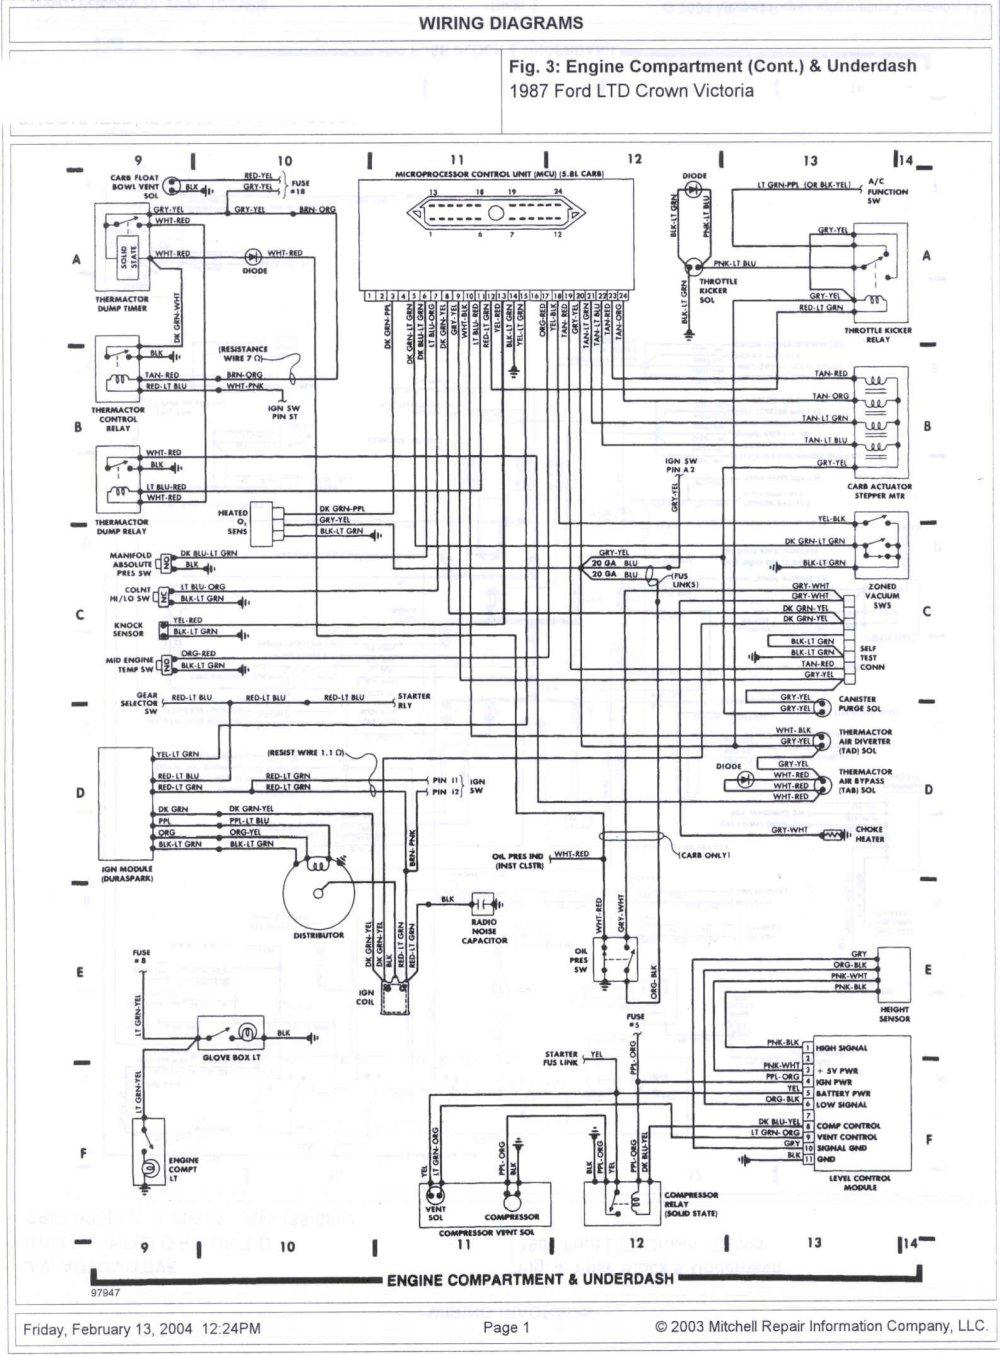 medium resolution of  1986 ford ltd wiring diagram wiring diagram ford crown victoria wiring diagram on 1992 ford